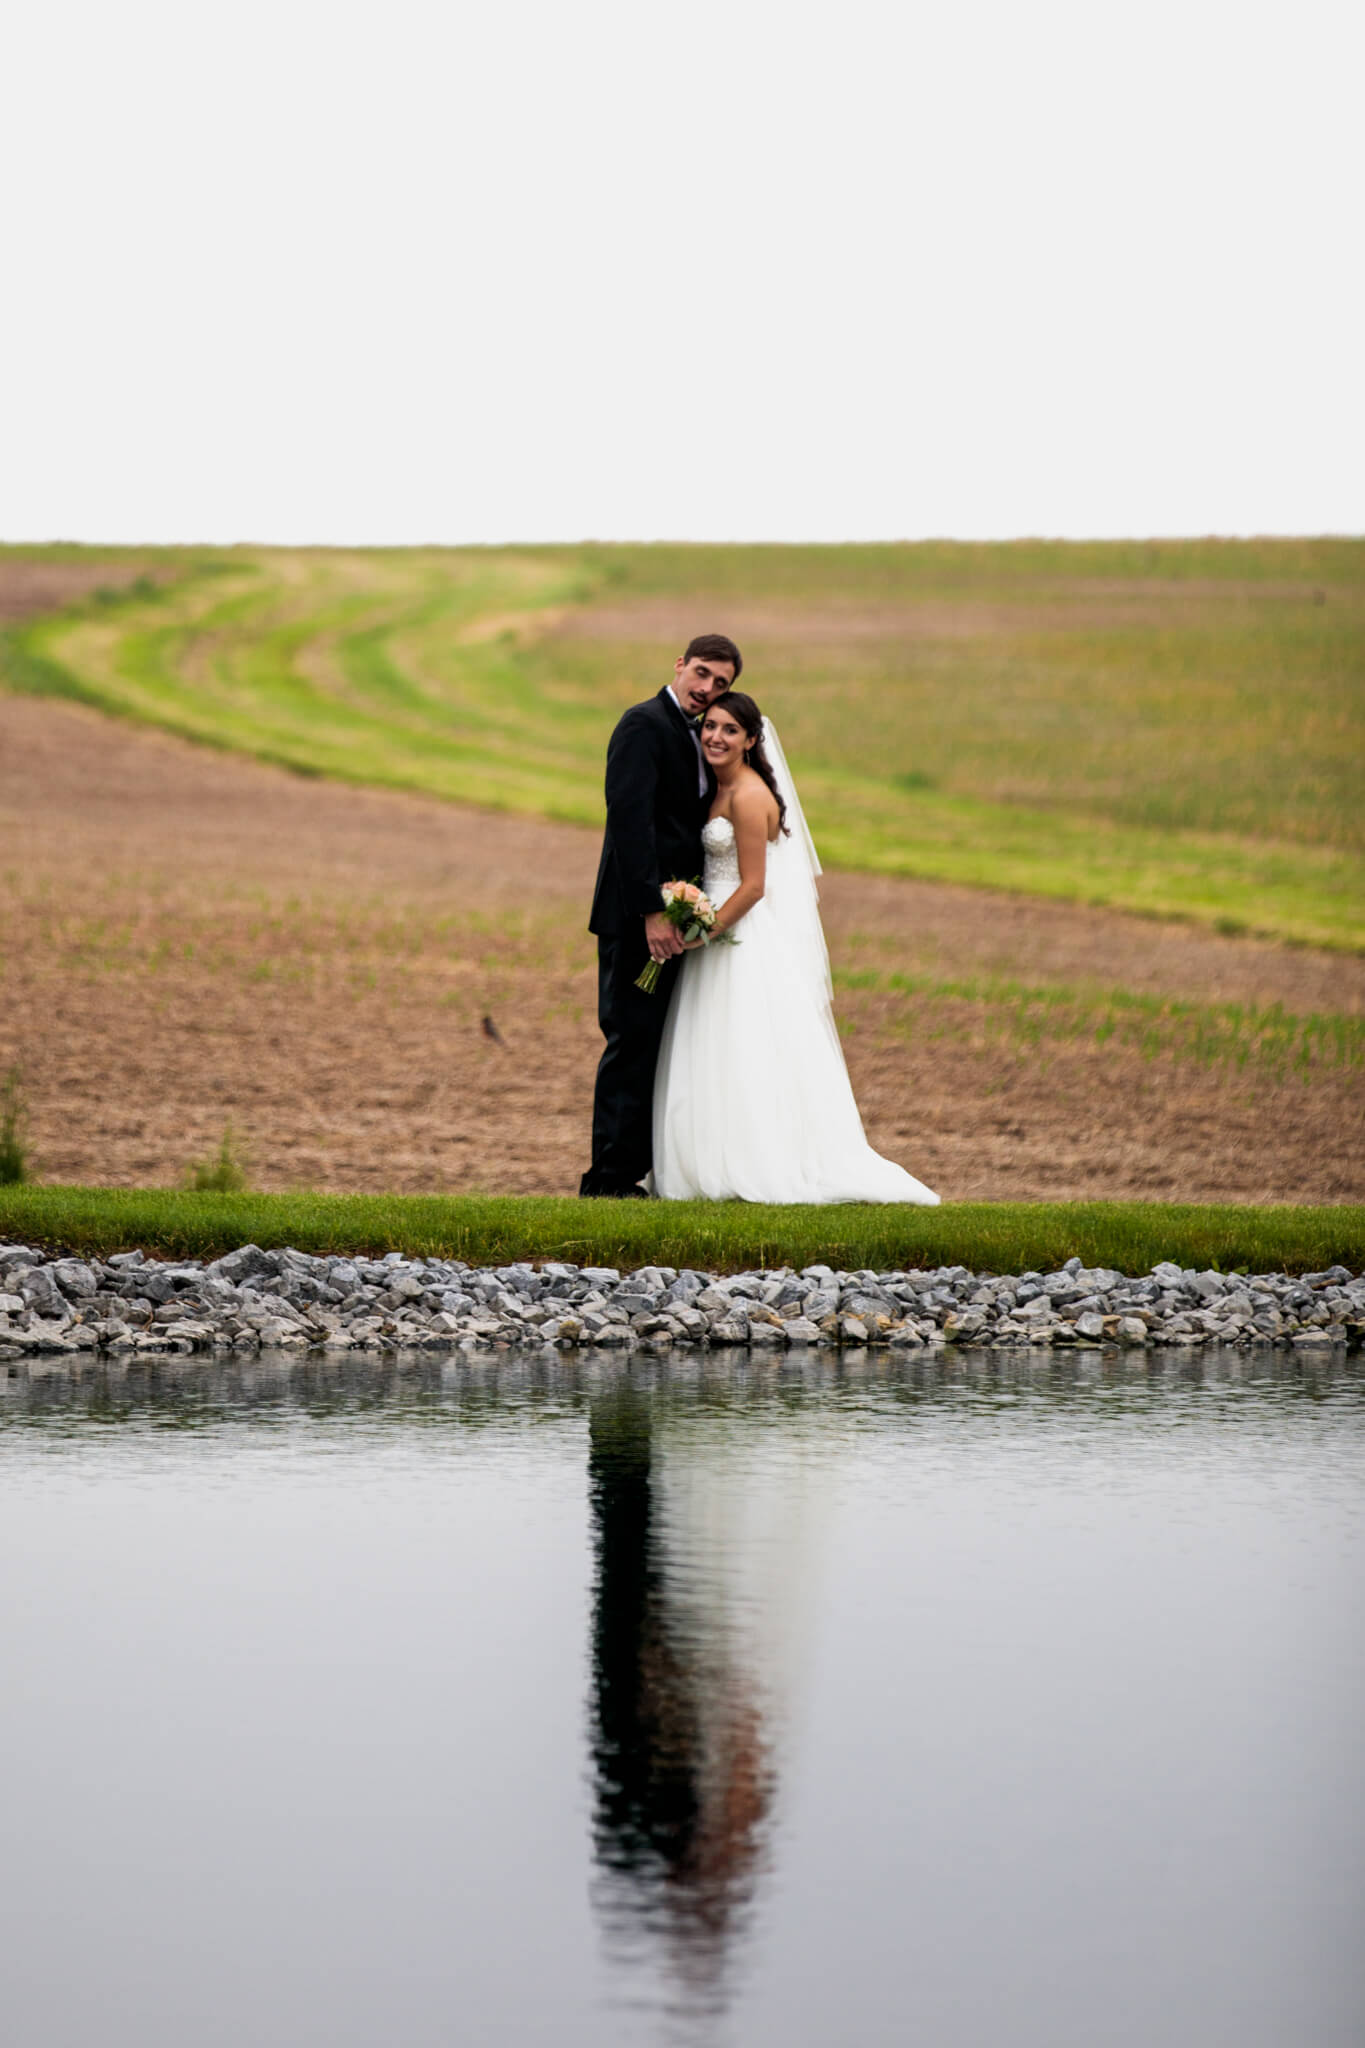 Alysia Jerad Homestead Blessings Farm Hershey PA Wedding Rustic Chique - 81.JPG